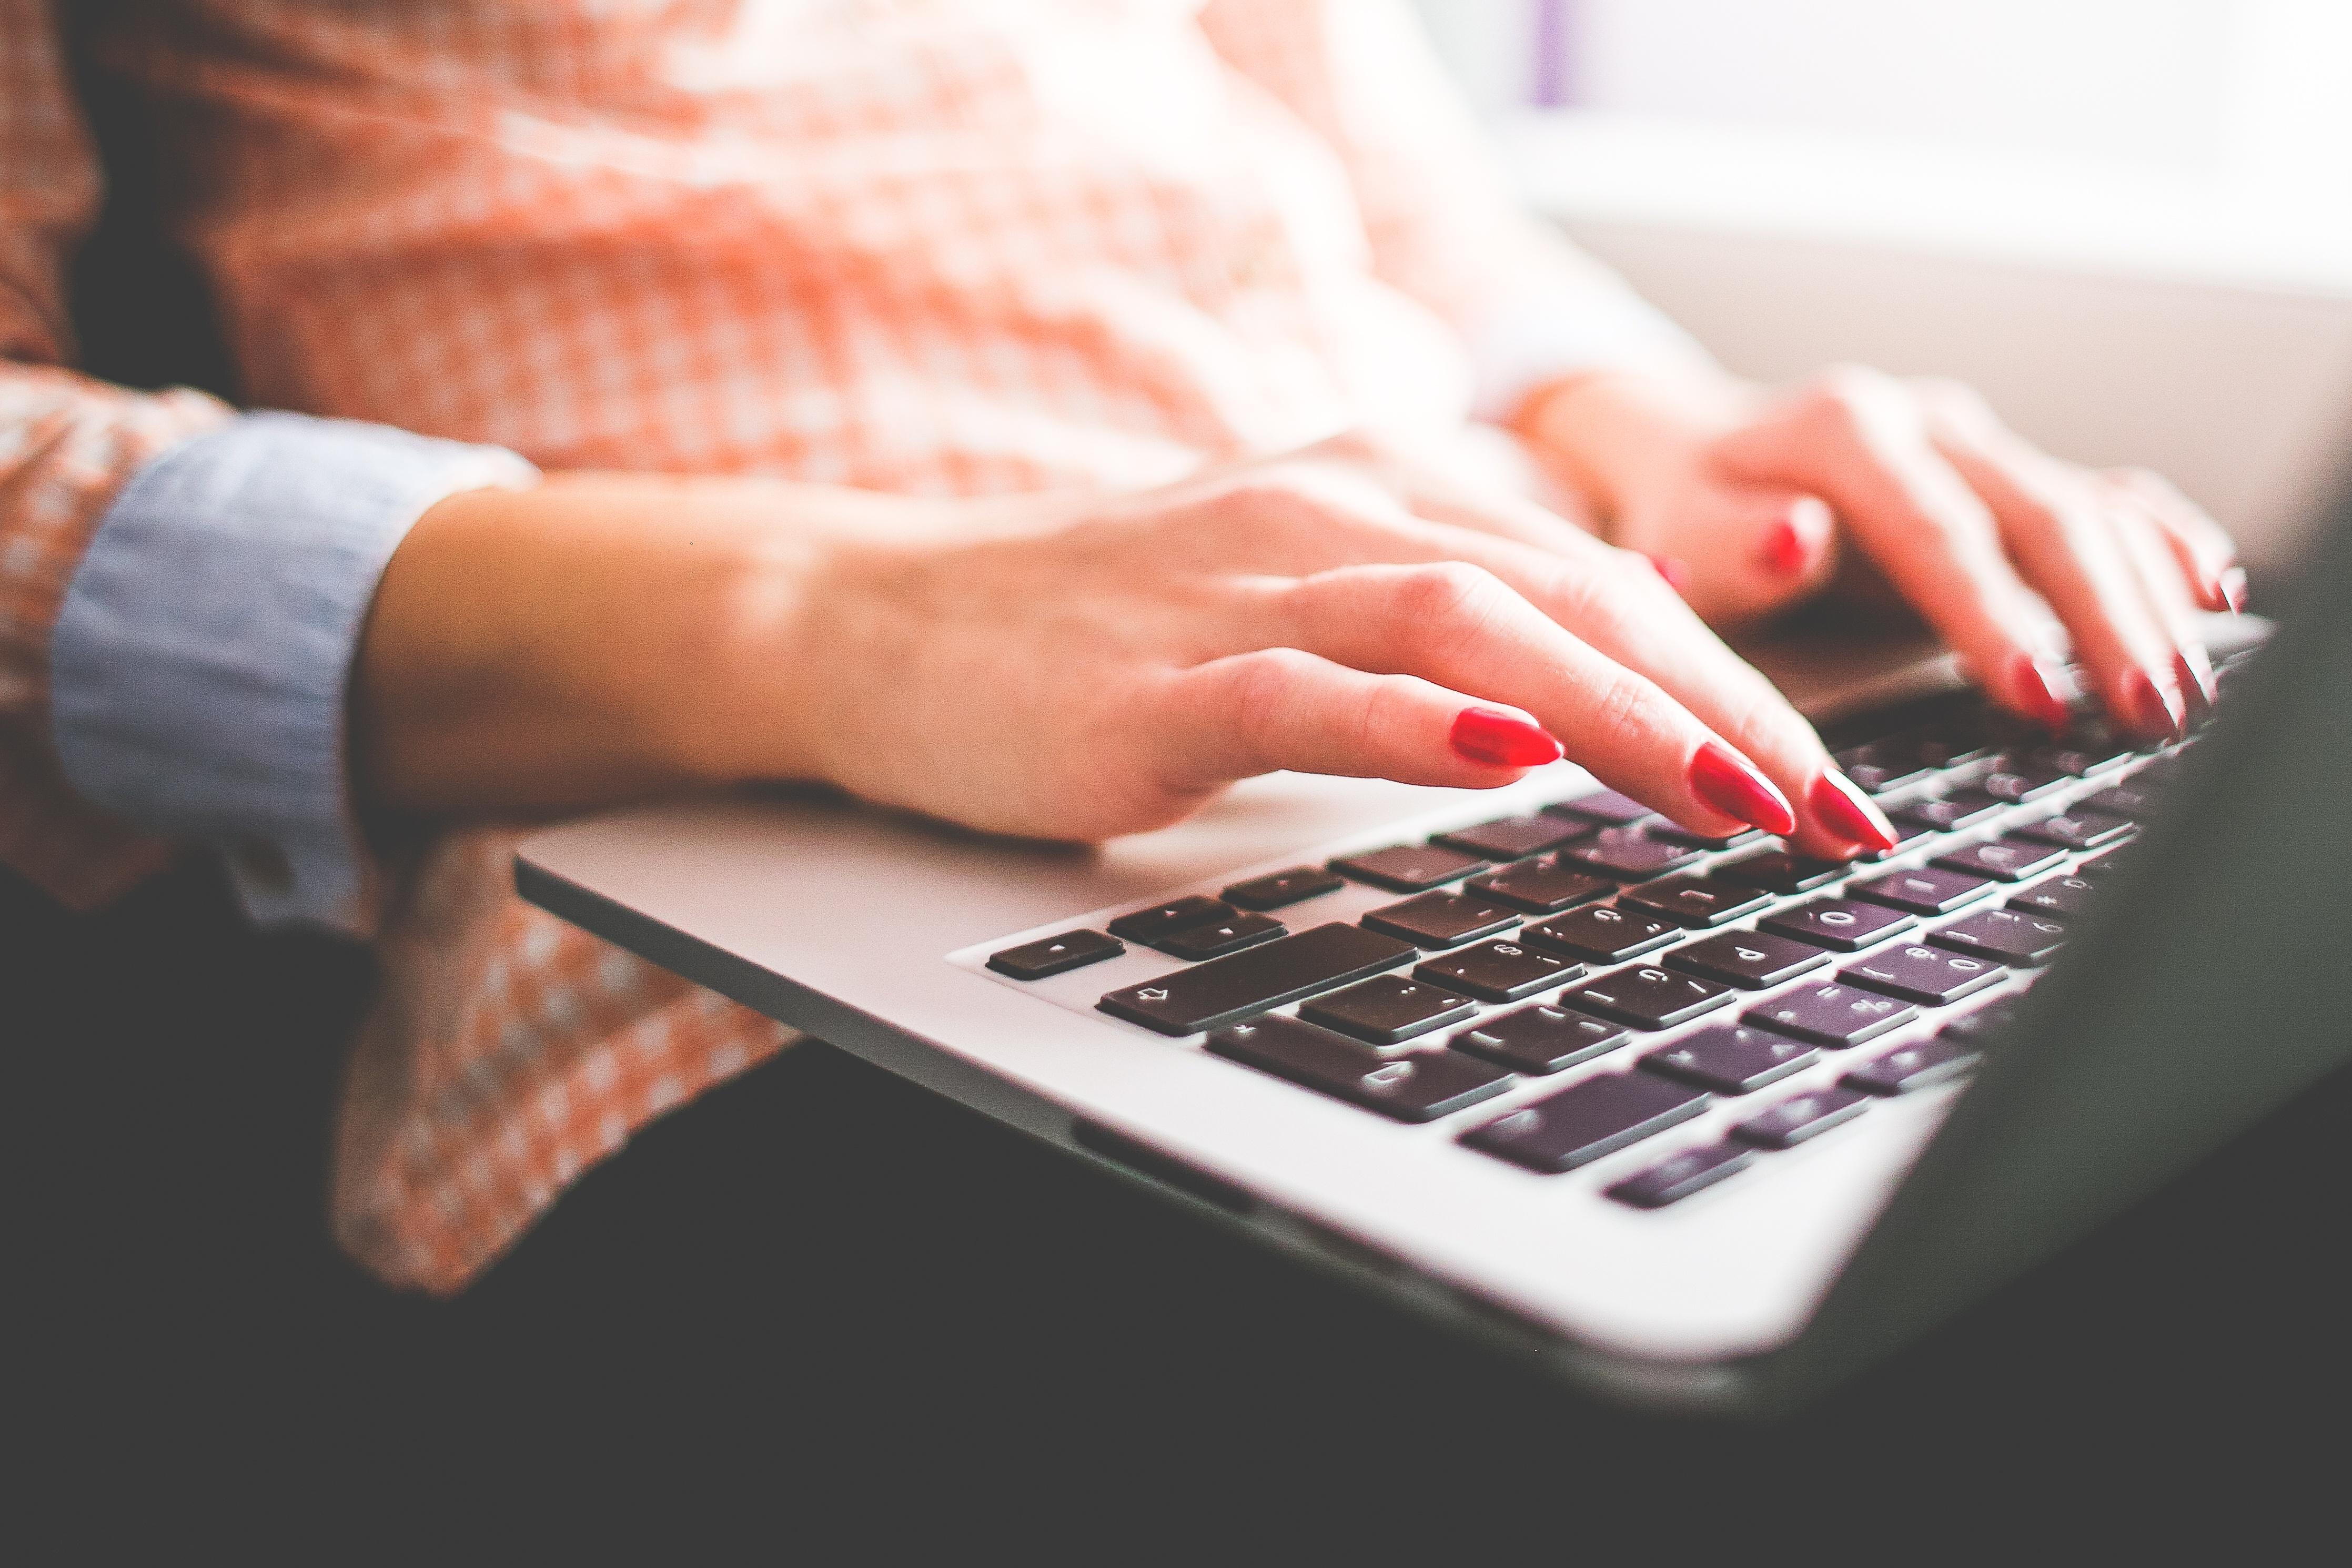 girl-typing-on-her-macbook-pro-close-up-picjumbo-com.jpg